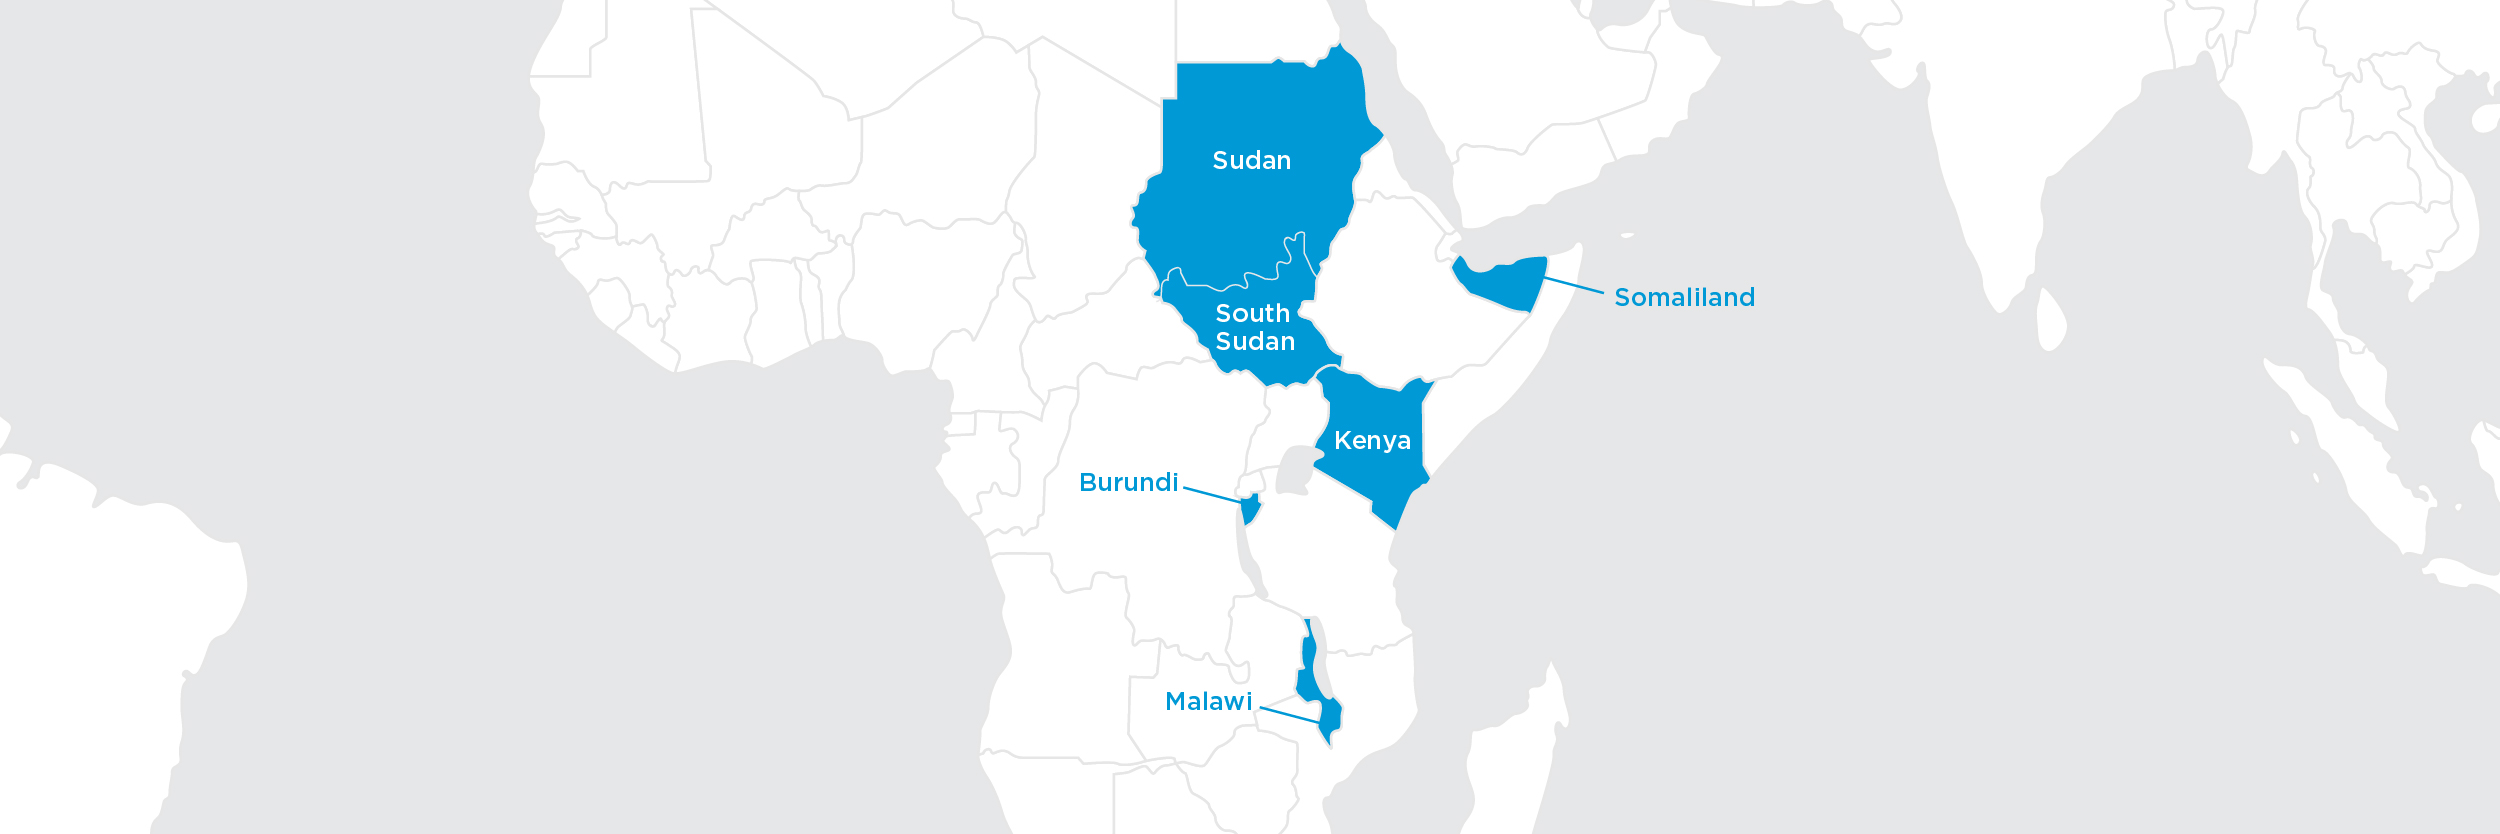 africa food crisis map - relief program